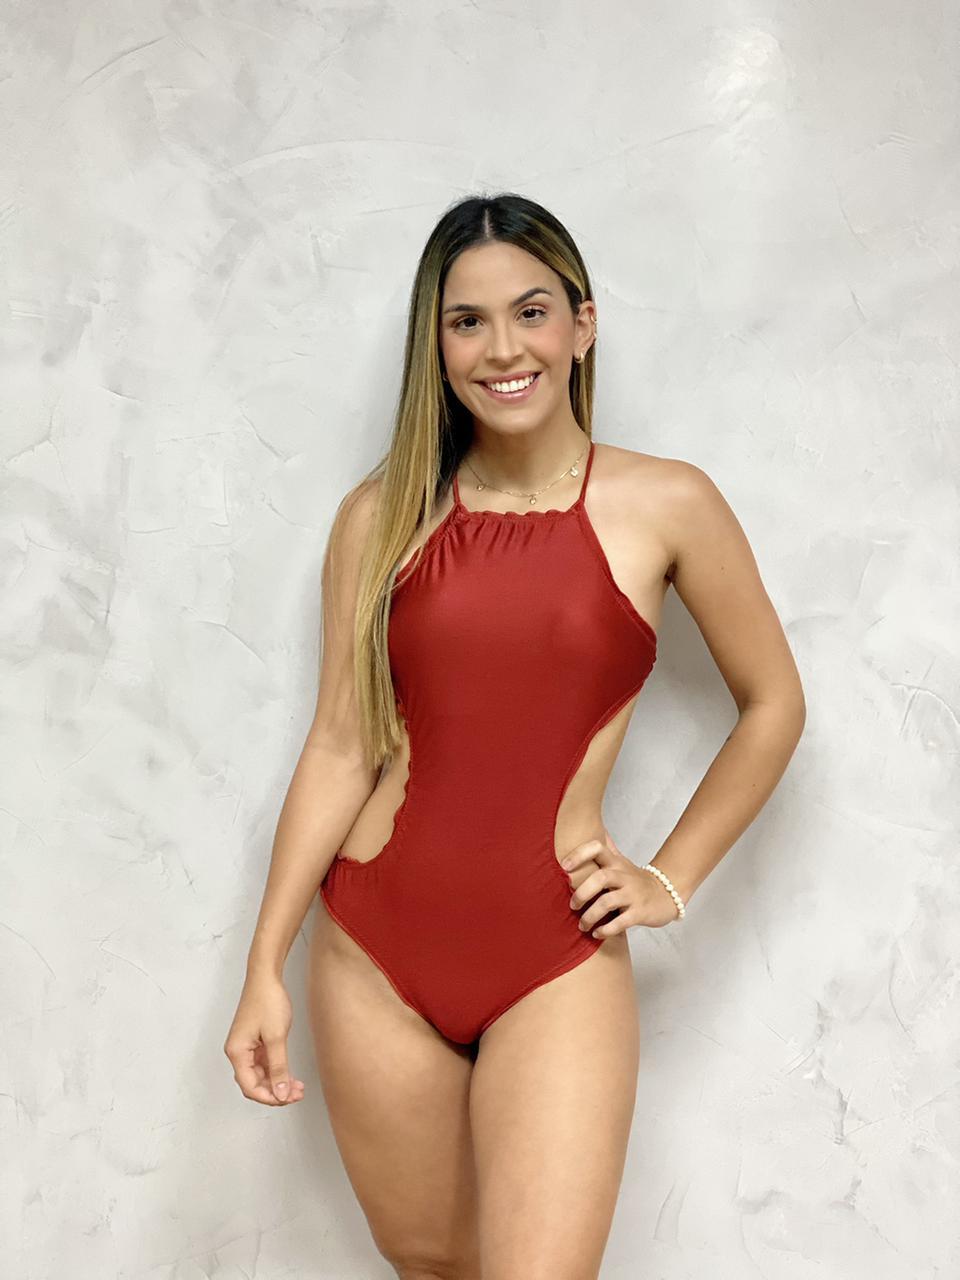 Maiô Ripple Adulto Cobre Metalizado   - RMCE BRAZIL